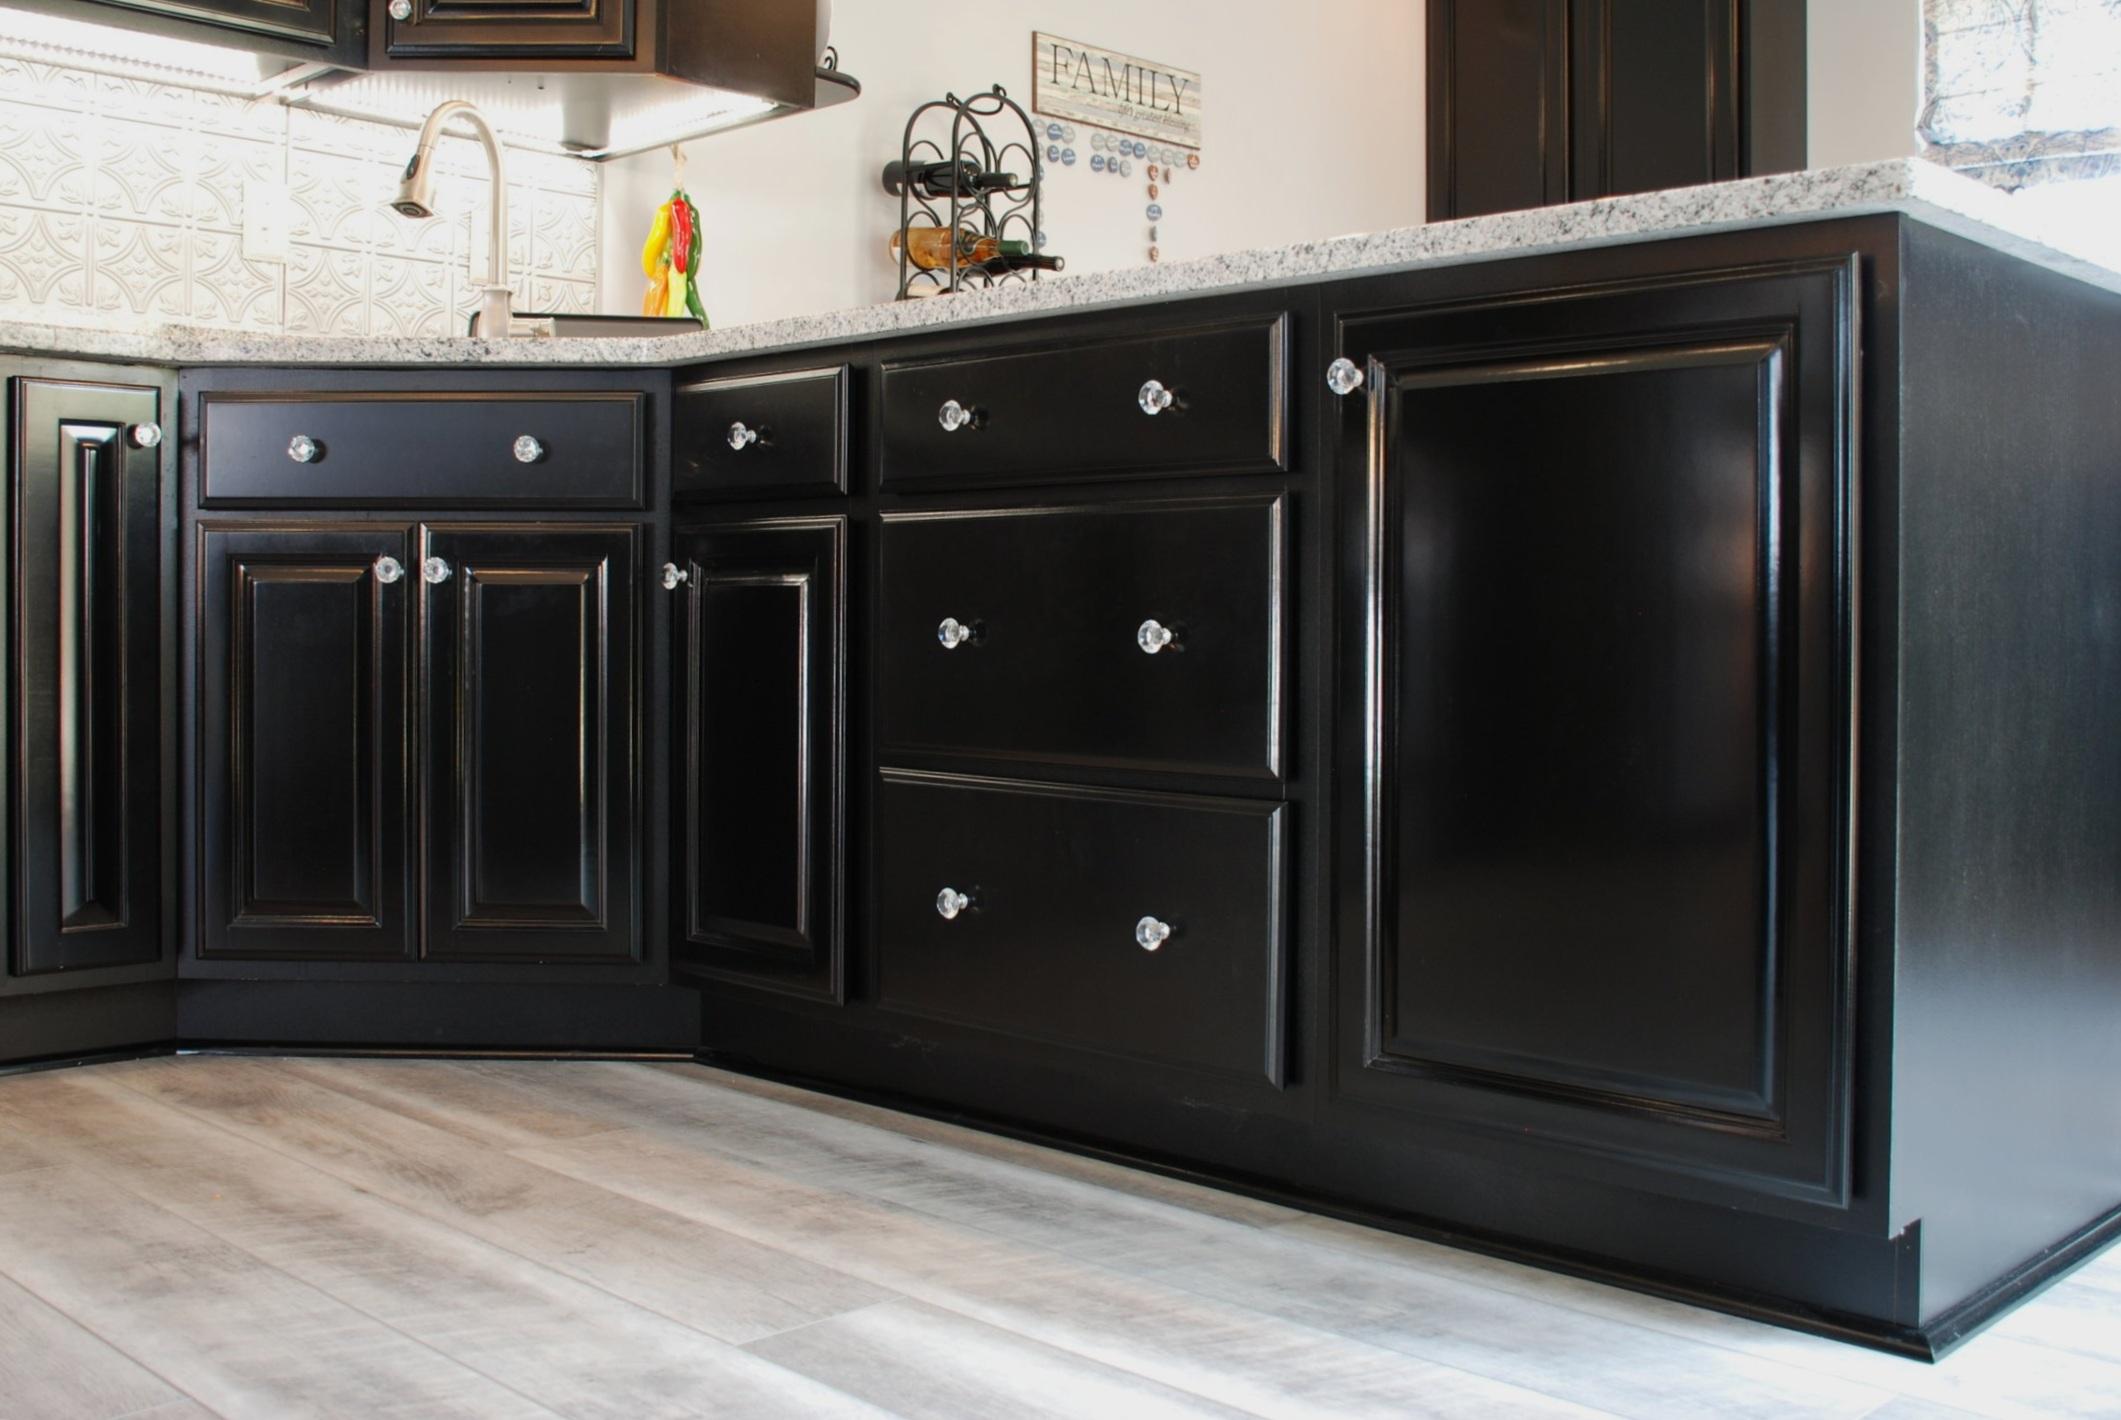 Kitchen Cabinet Refinishing Process West Interior Services